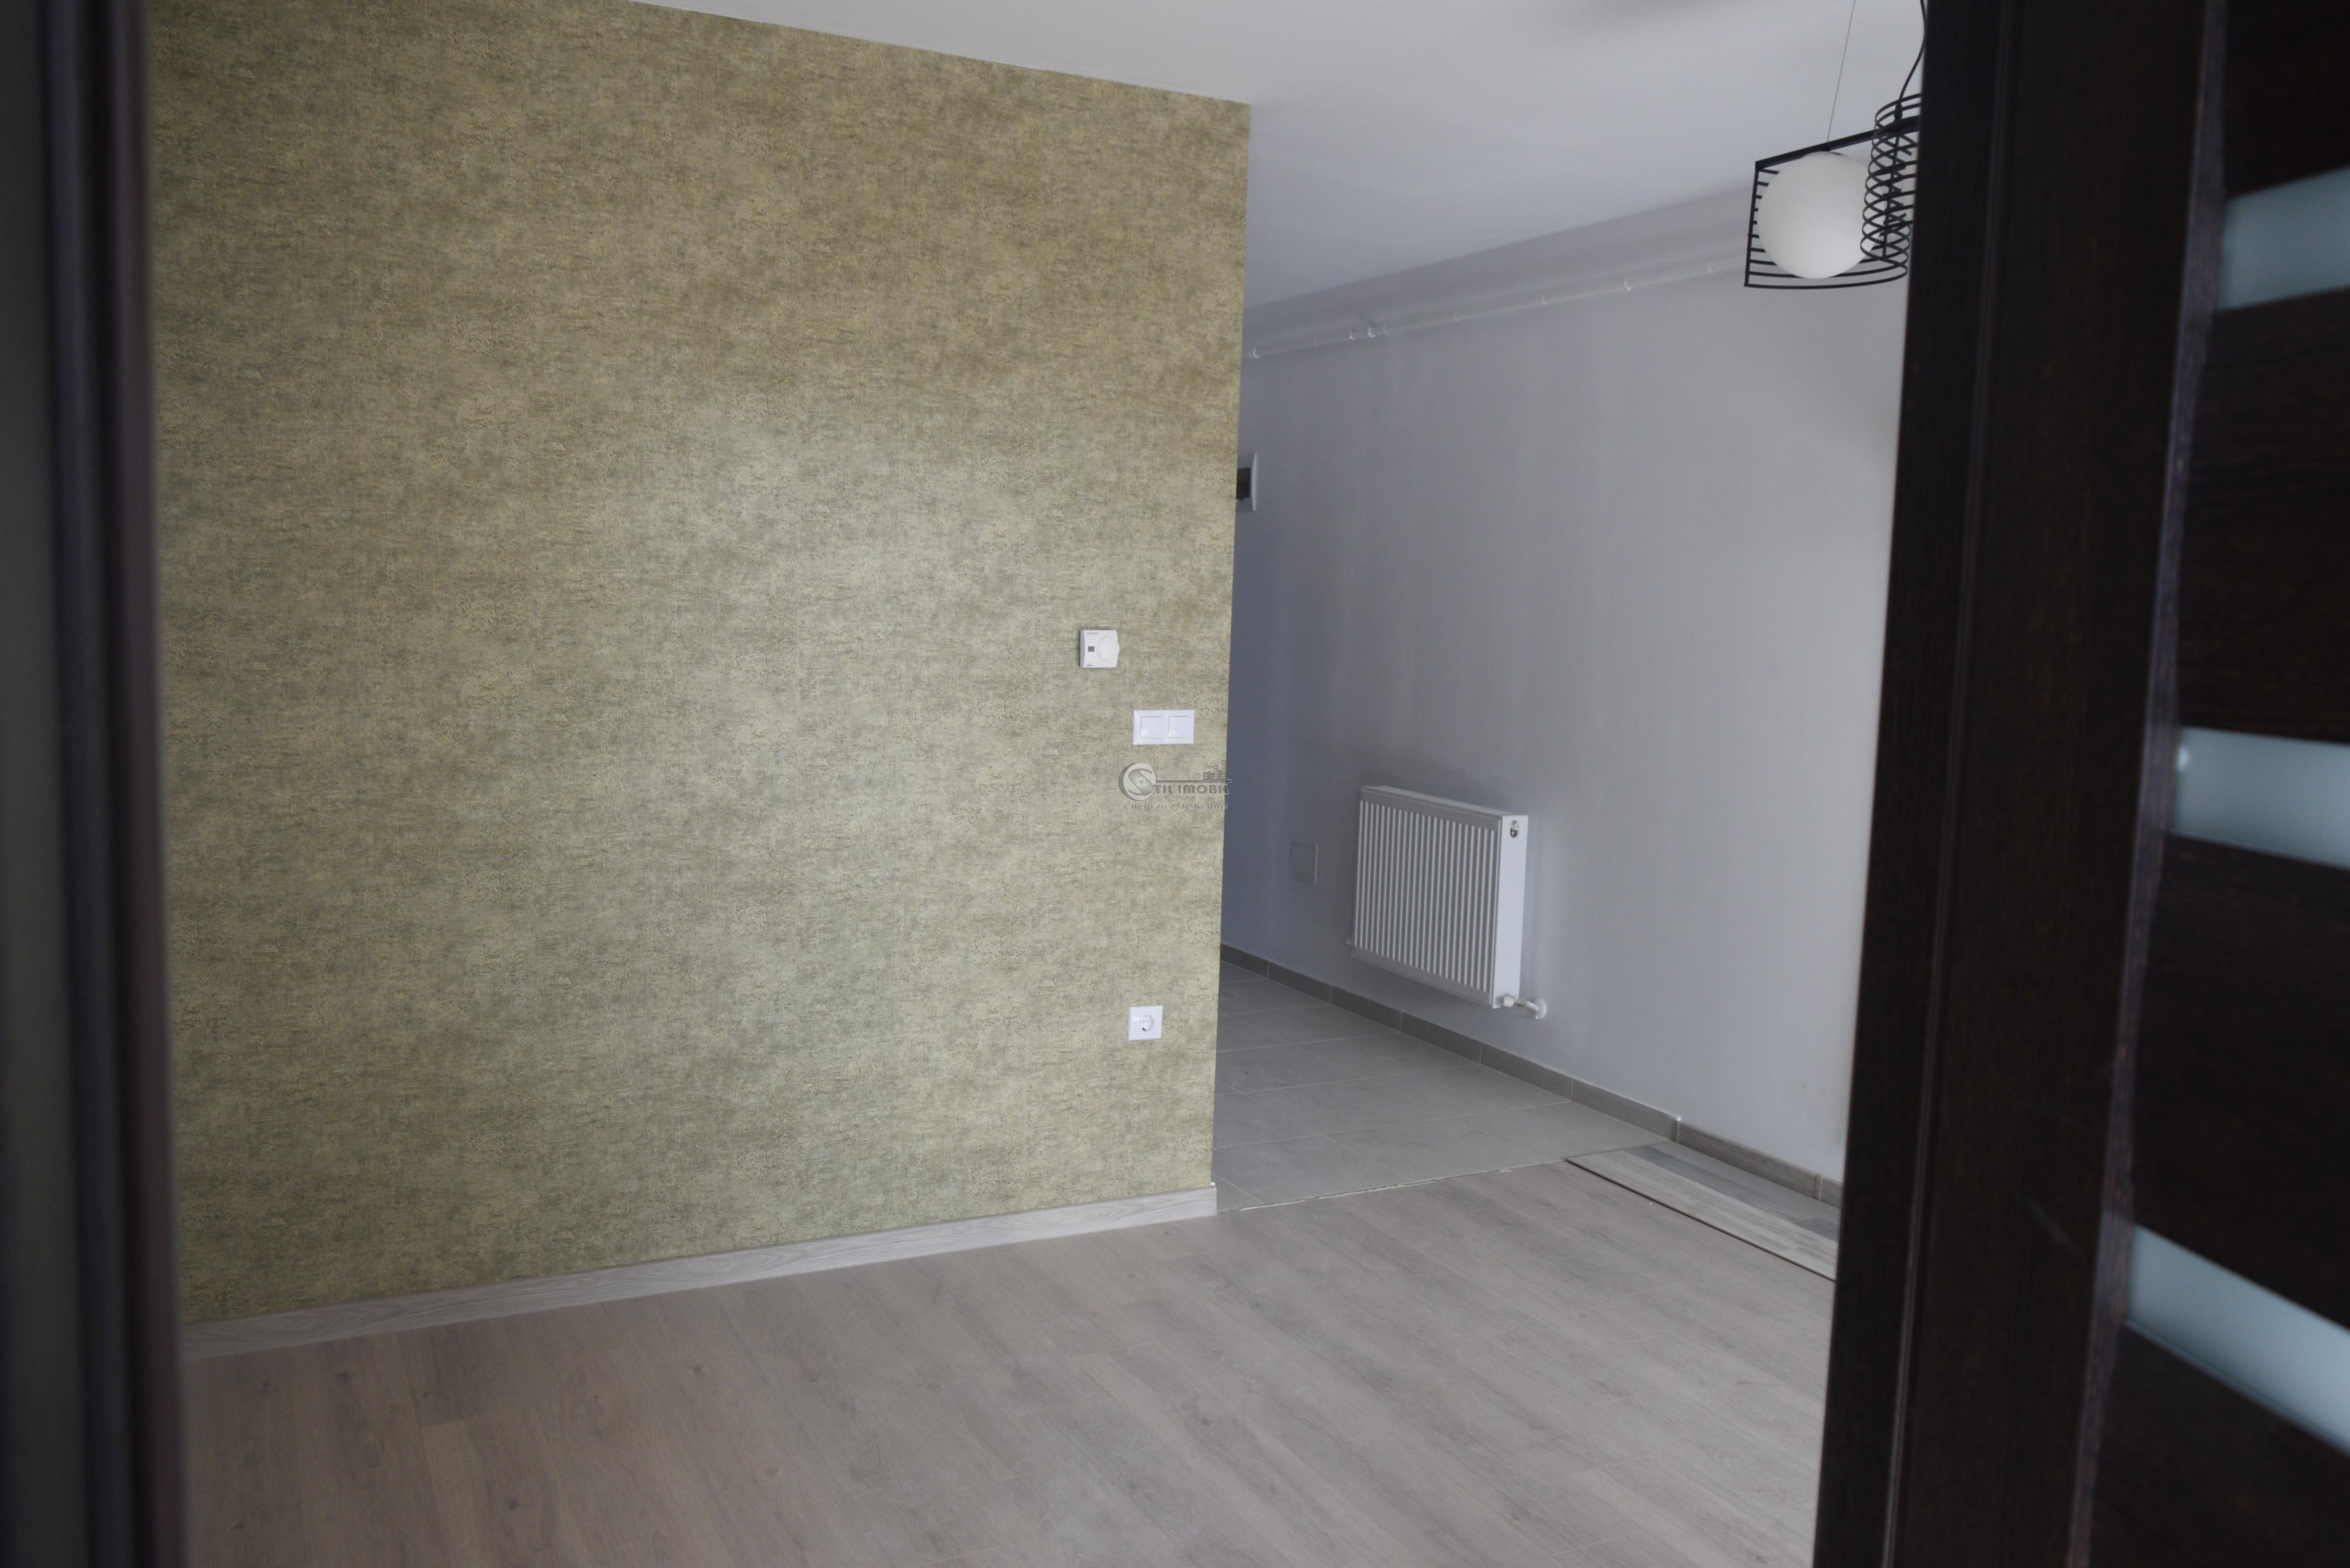 Apartament 2 camere,58mp ,Nicolina Galata Platou, bl nou